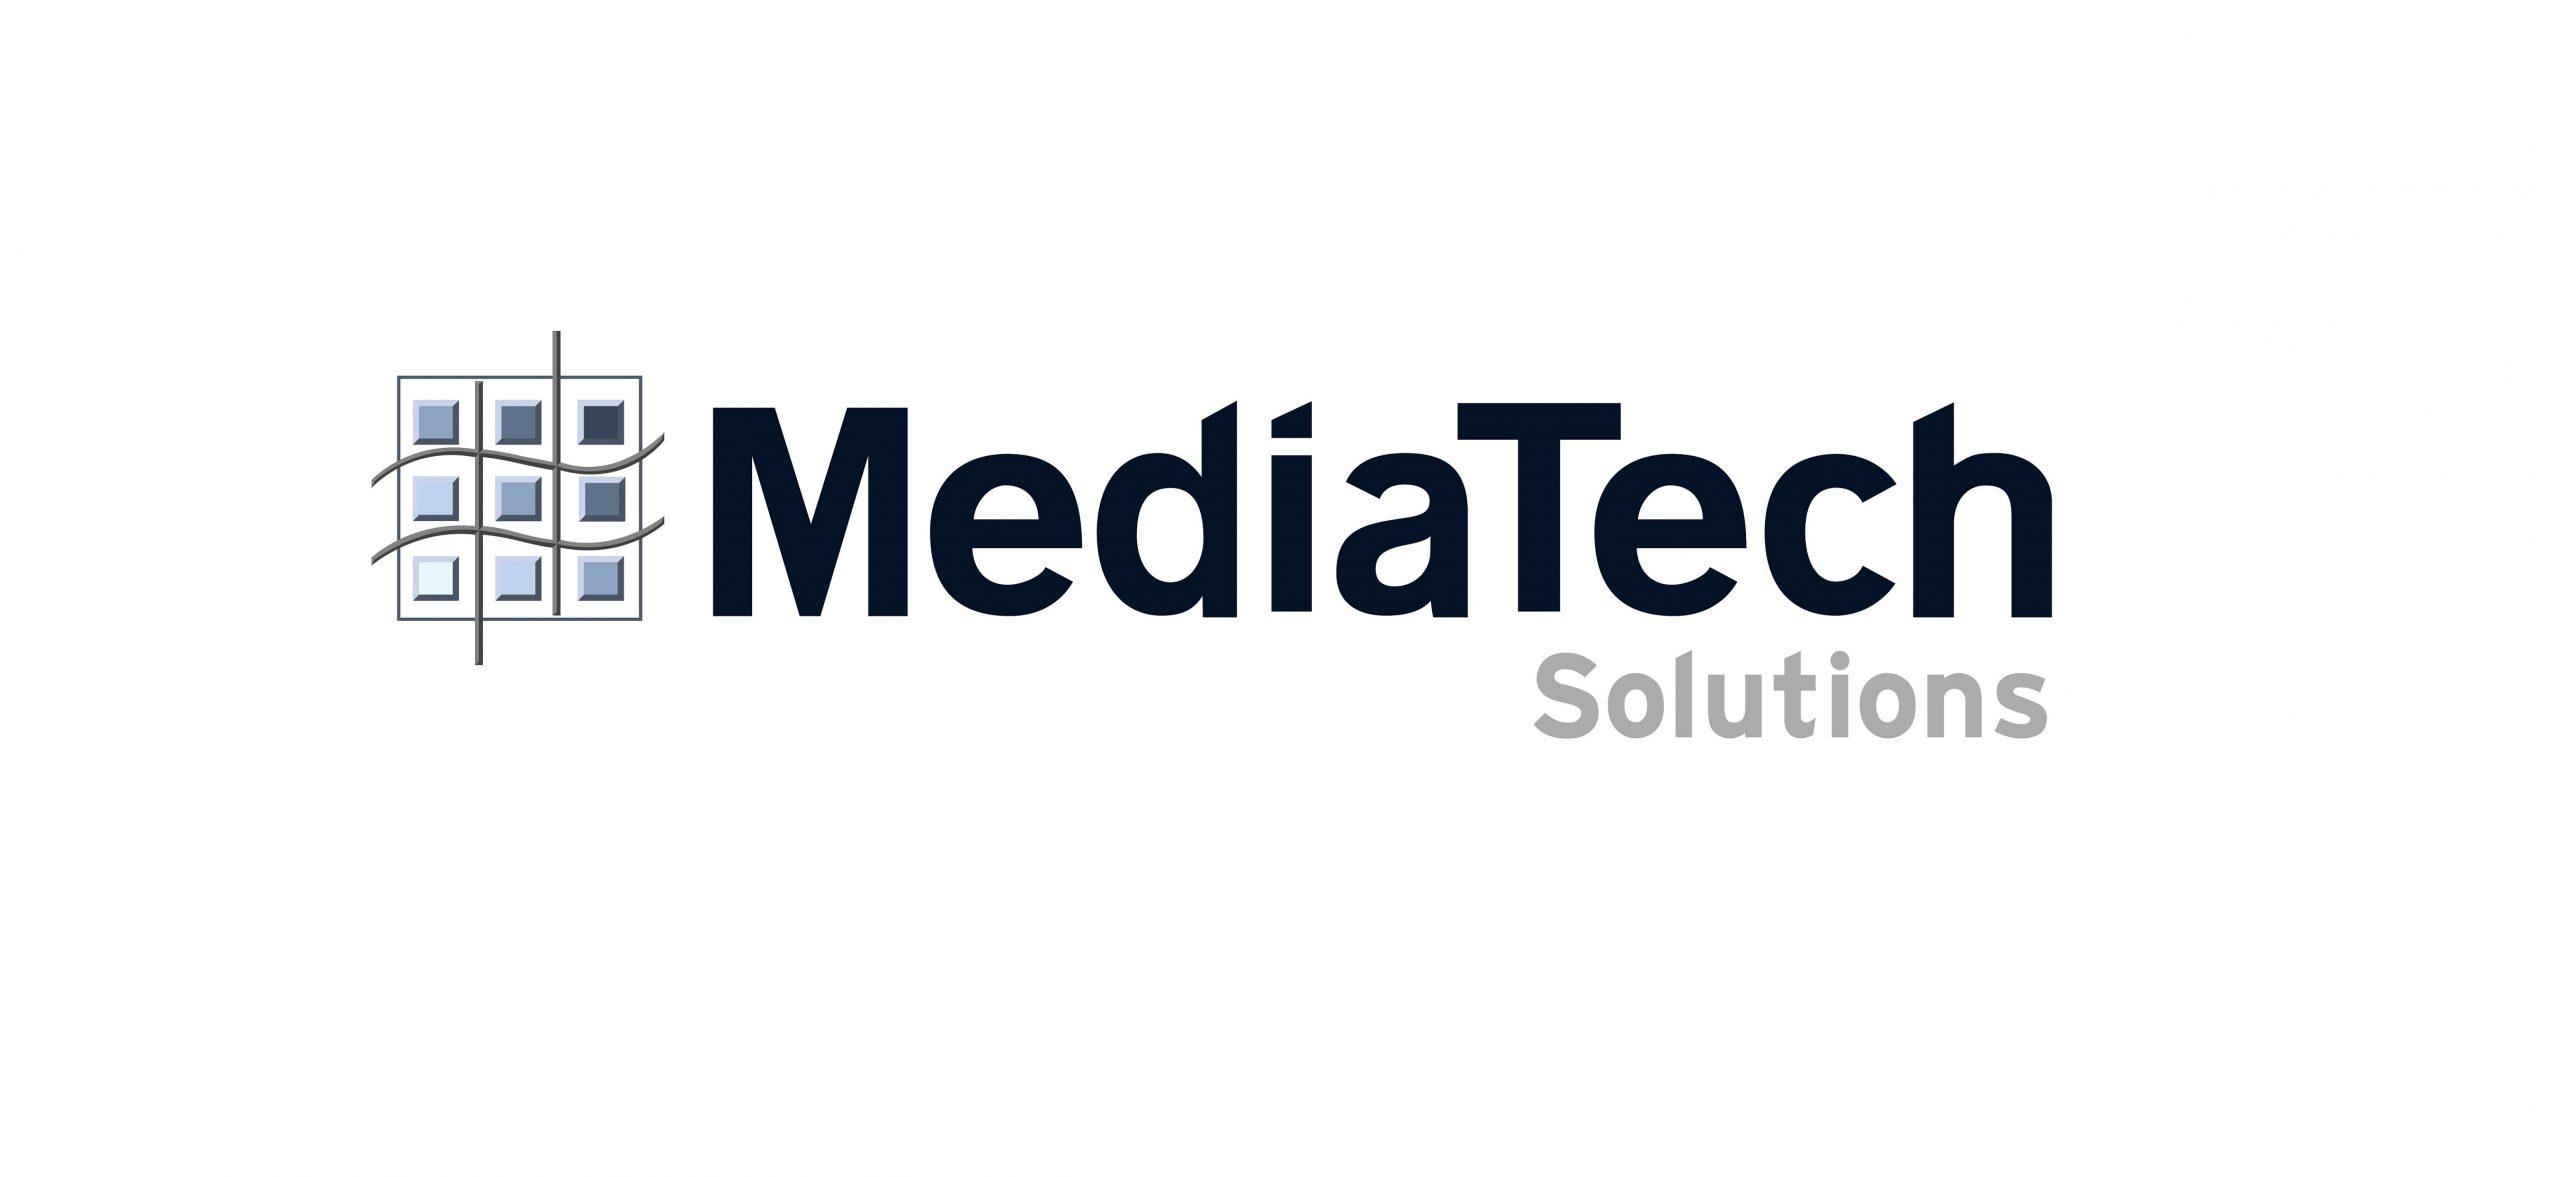 Mediatech Solutions lance planetiwin365 en Espagne